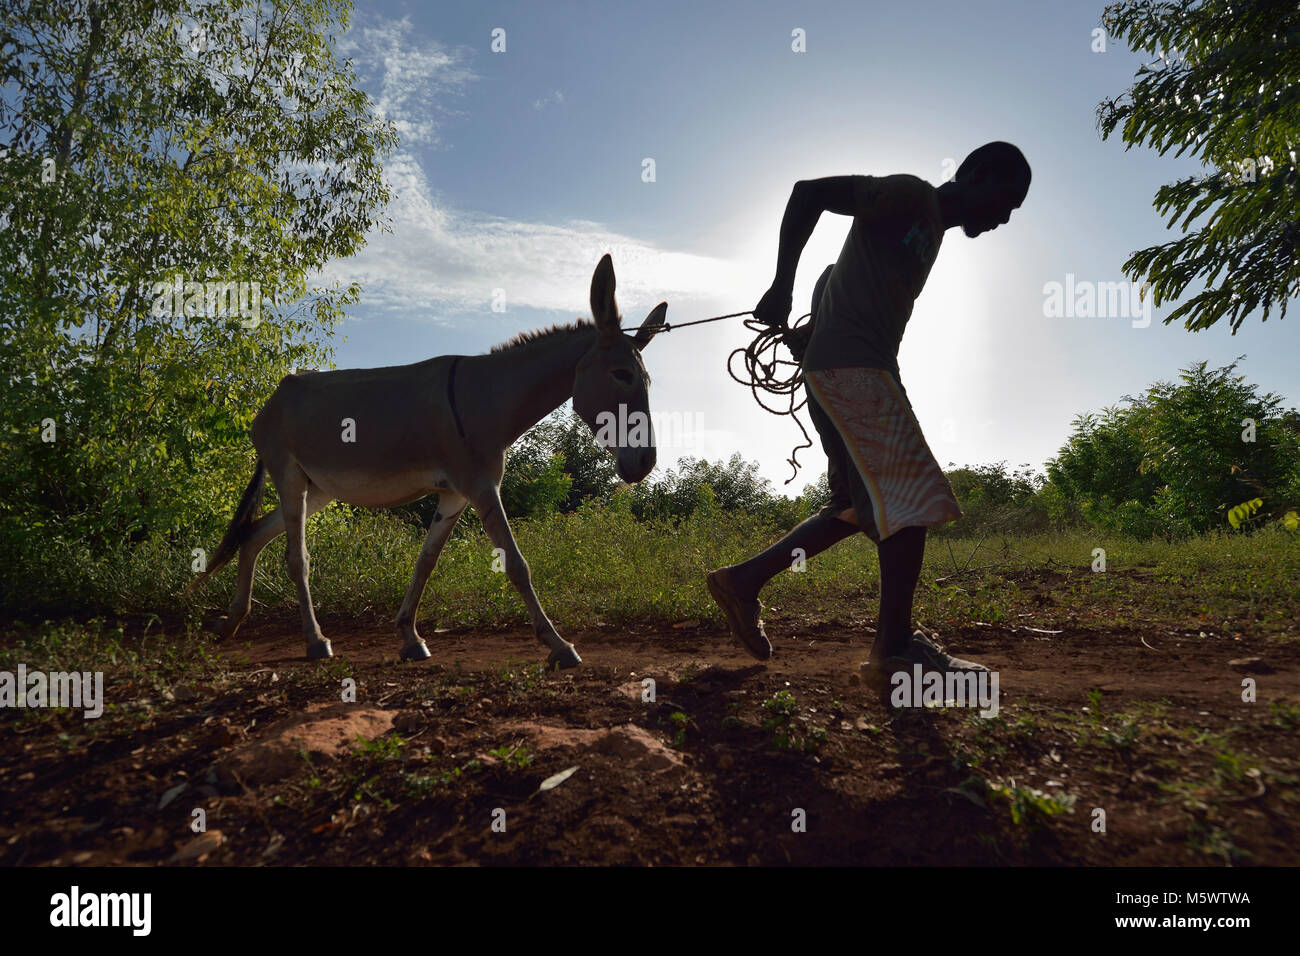 Lovius Joseph pulls a donkey in Picmy, a village on the Haitian island of La Gonave. - Stock Image